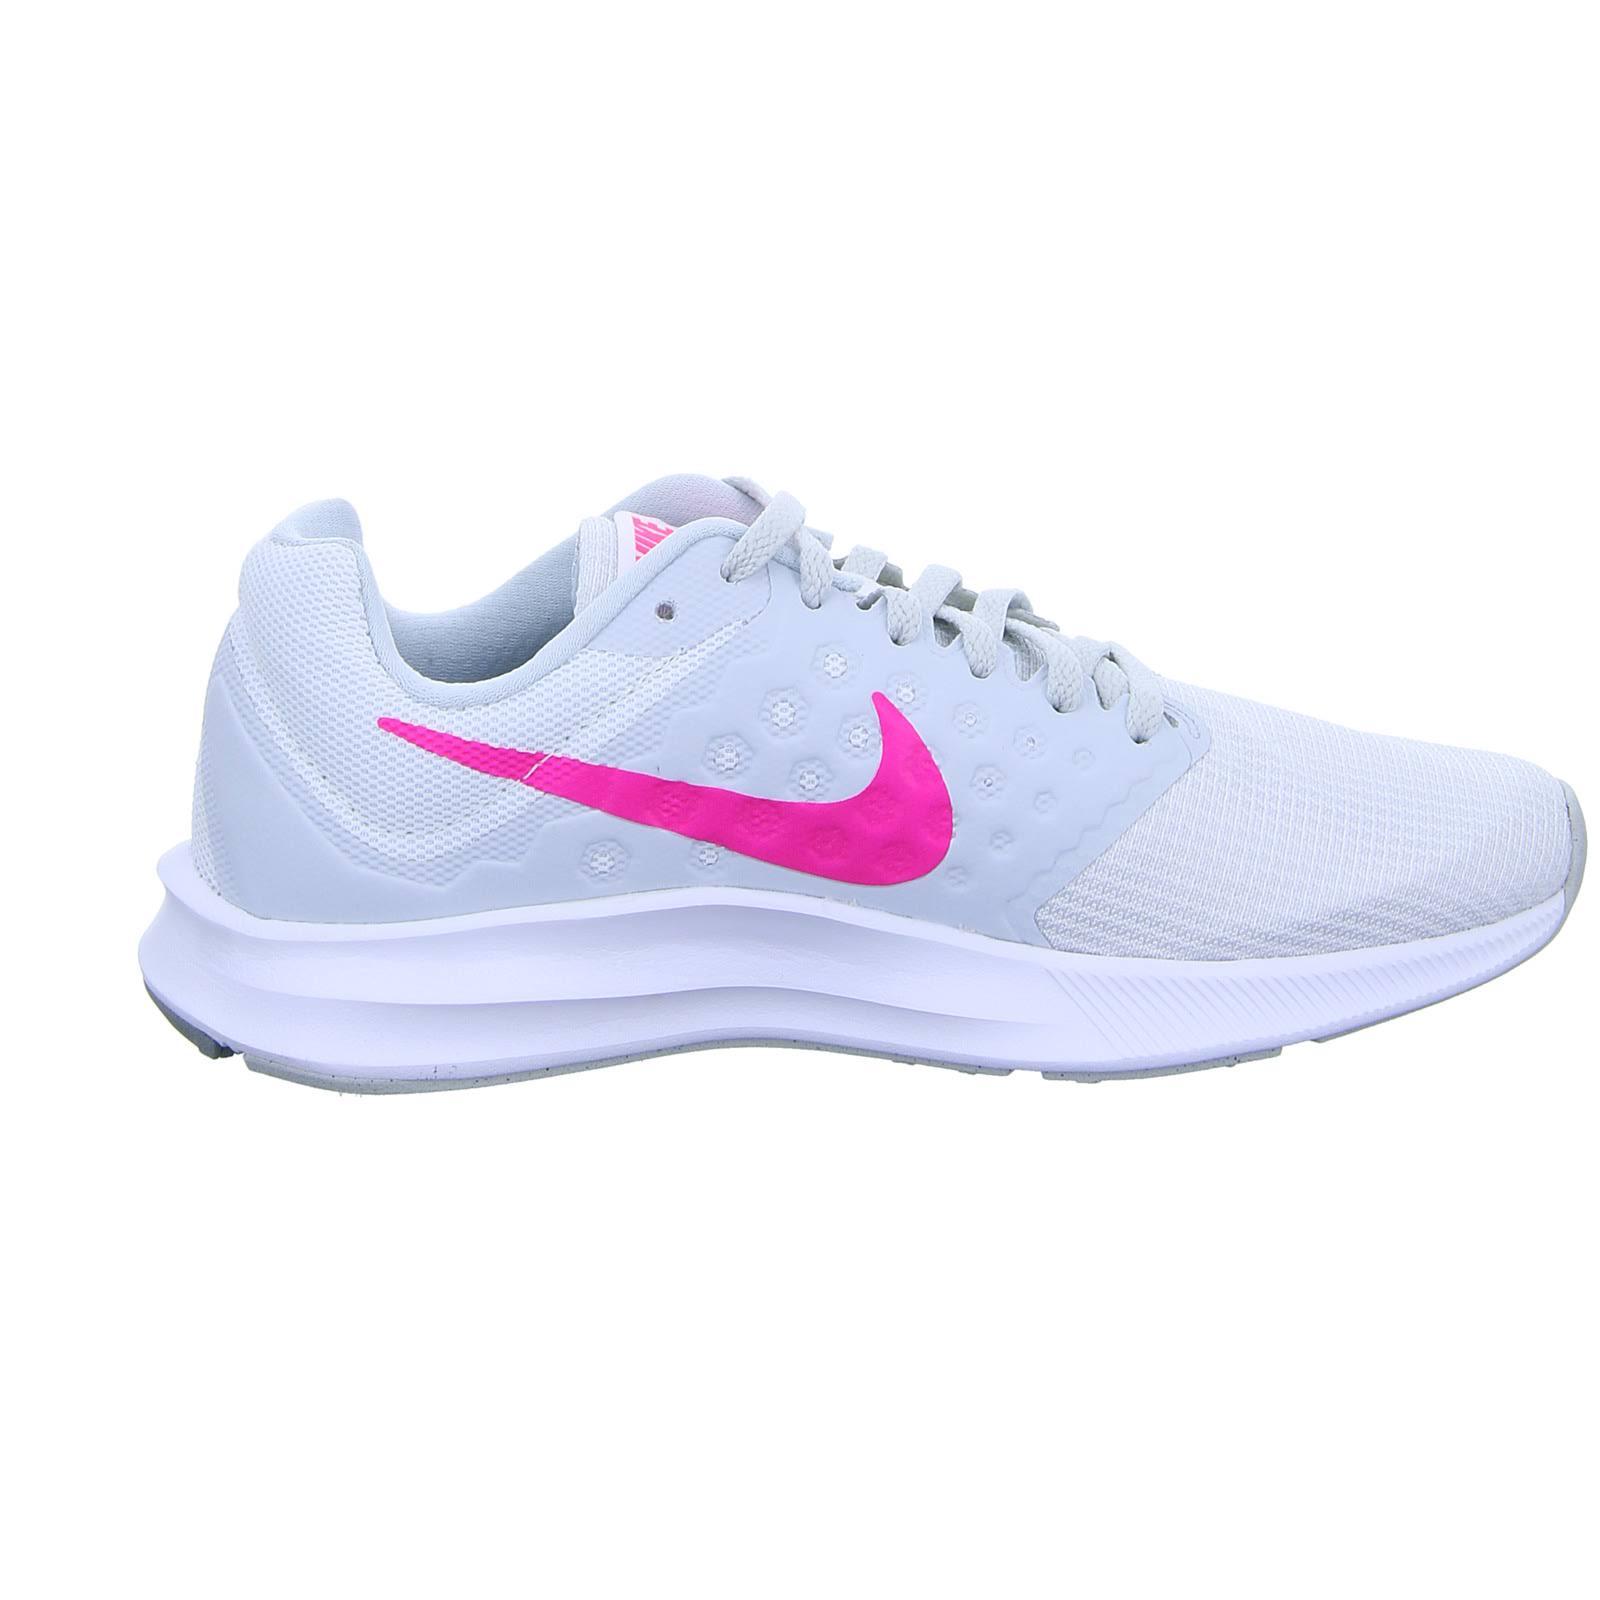 5 Damen hyper white Platinum 37 Pink Mehrfarbig Platinum pure Downshifter 7 black Laufschuhe Eu black Nike BqdAU7F7